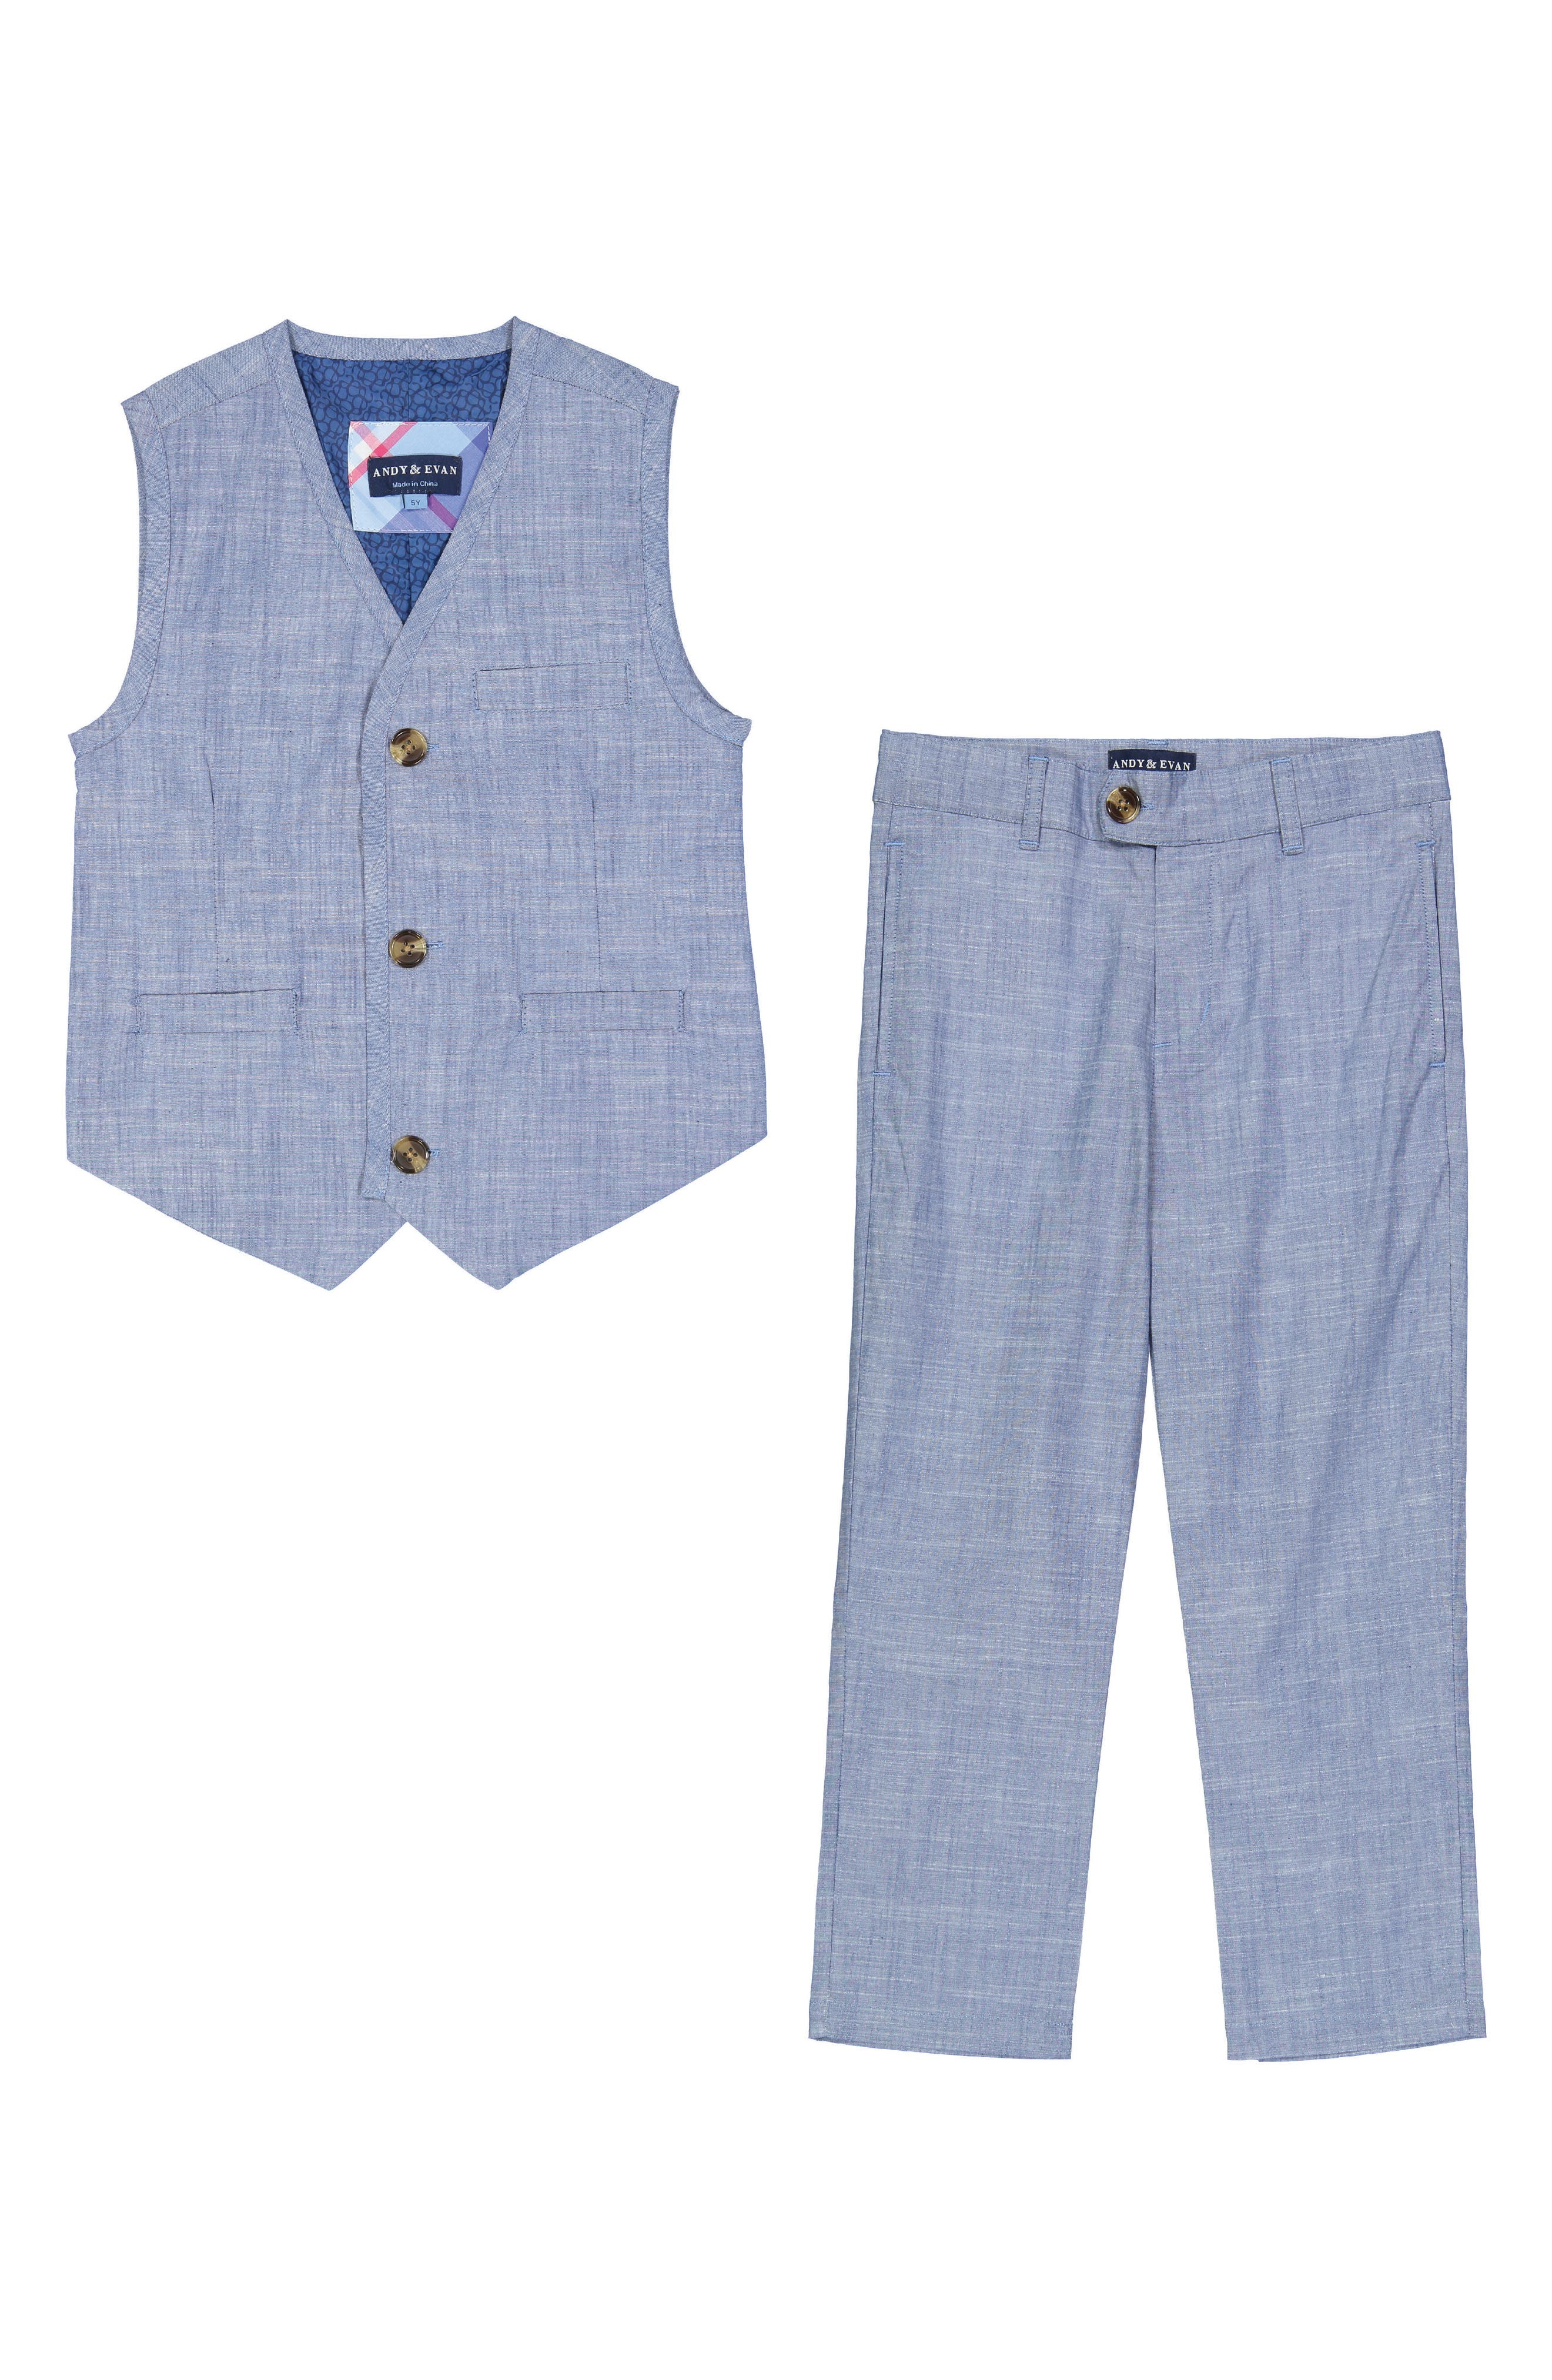 Chambray Vest & Pants Set,                             Main thumbnail 1, color,                             424